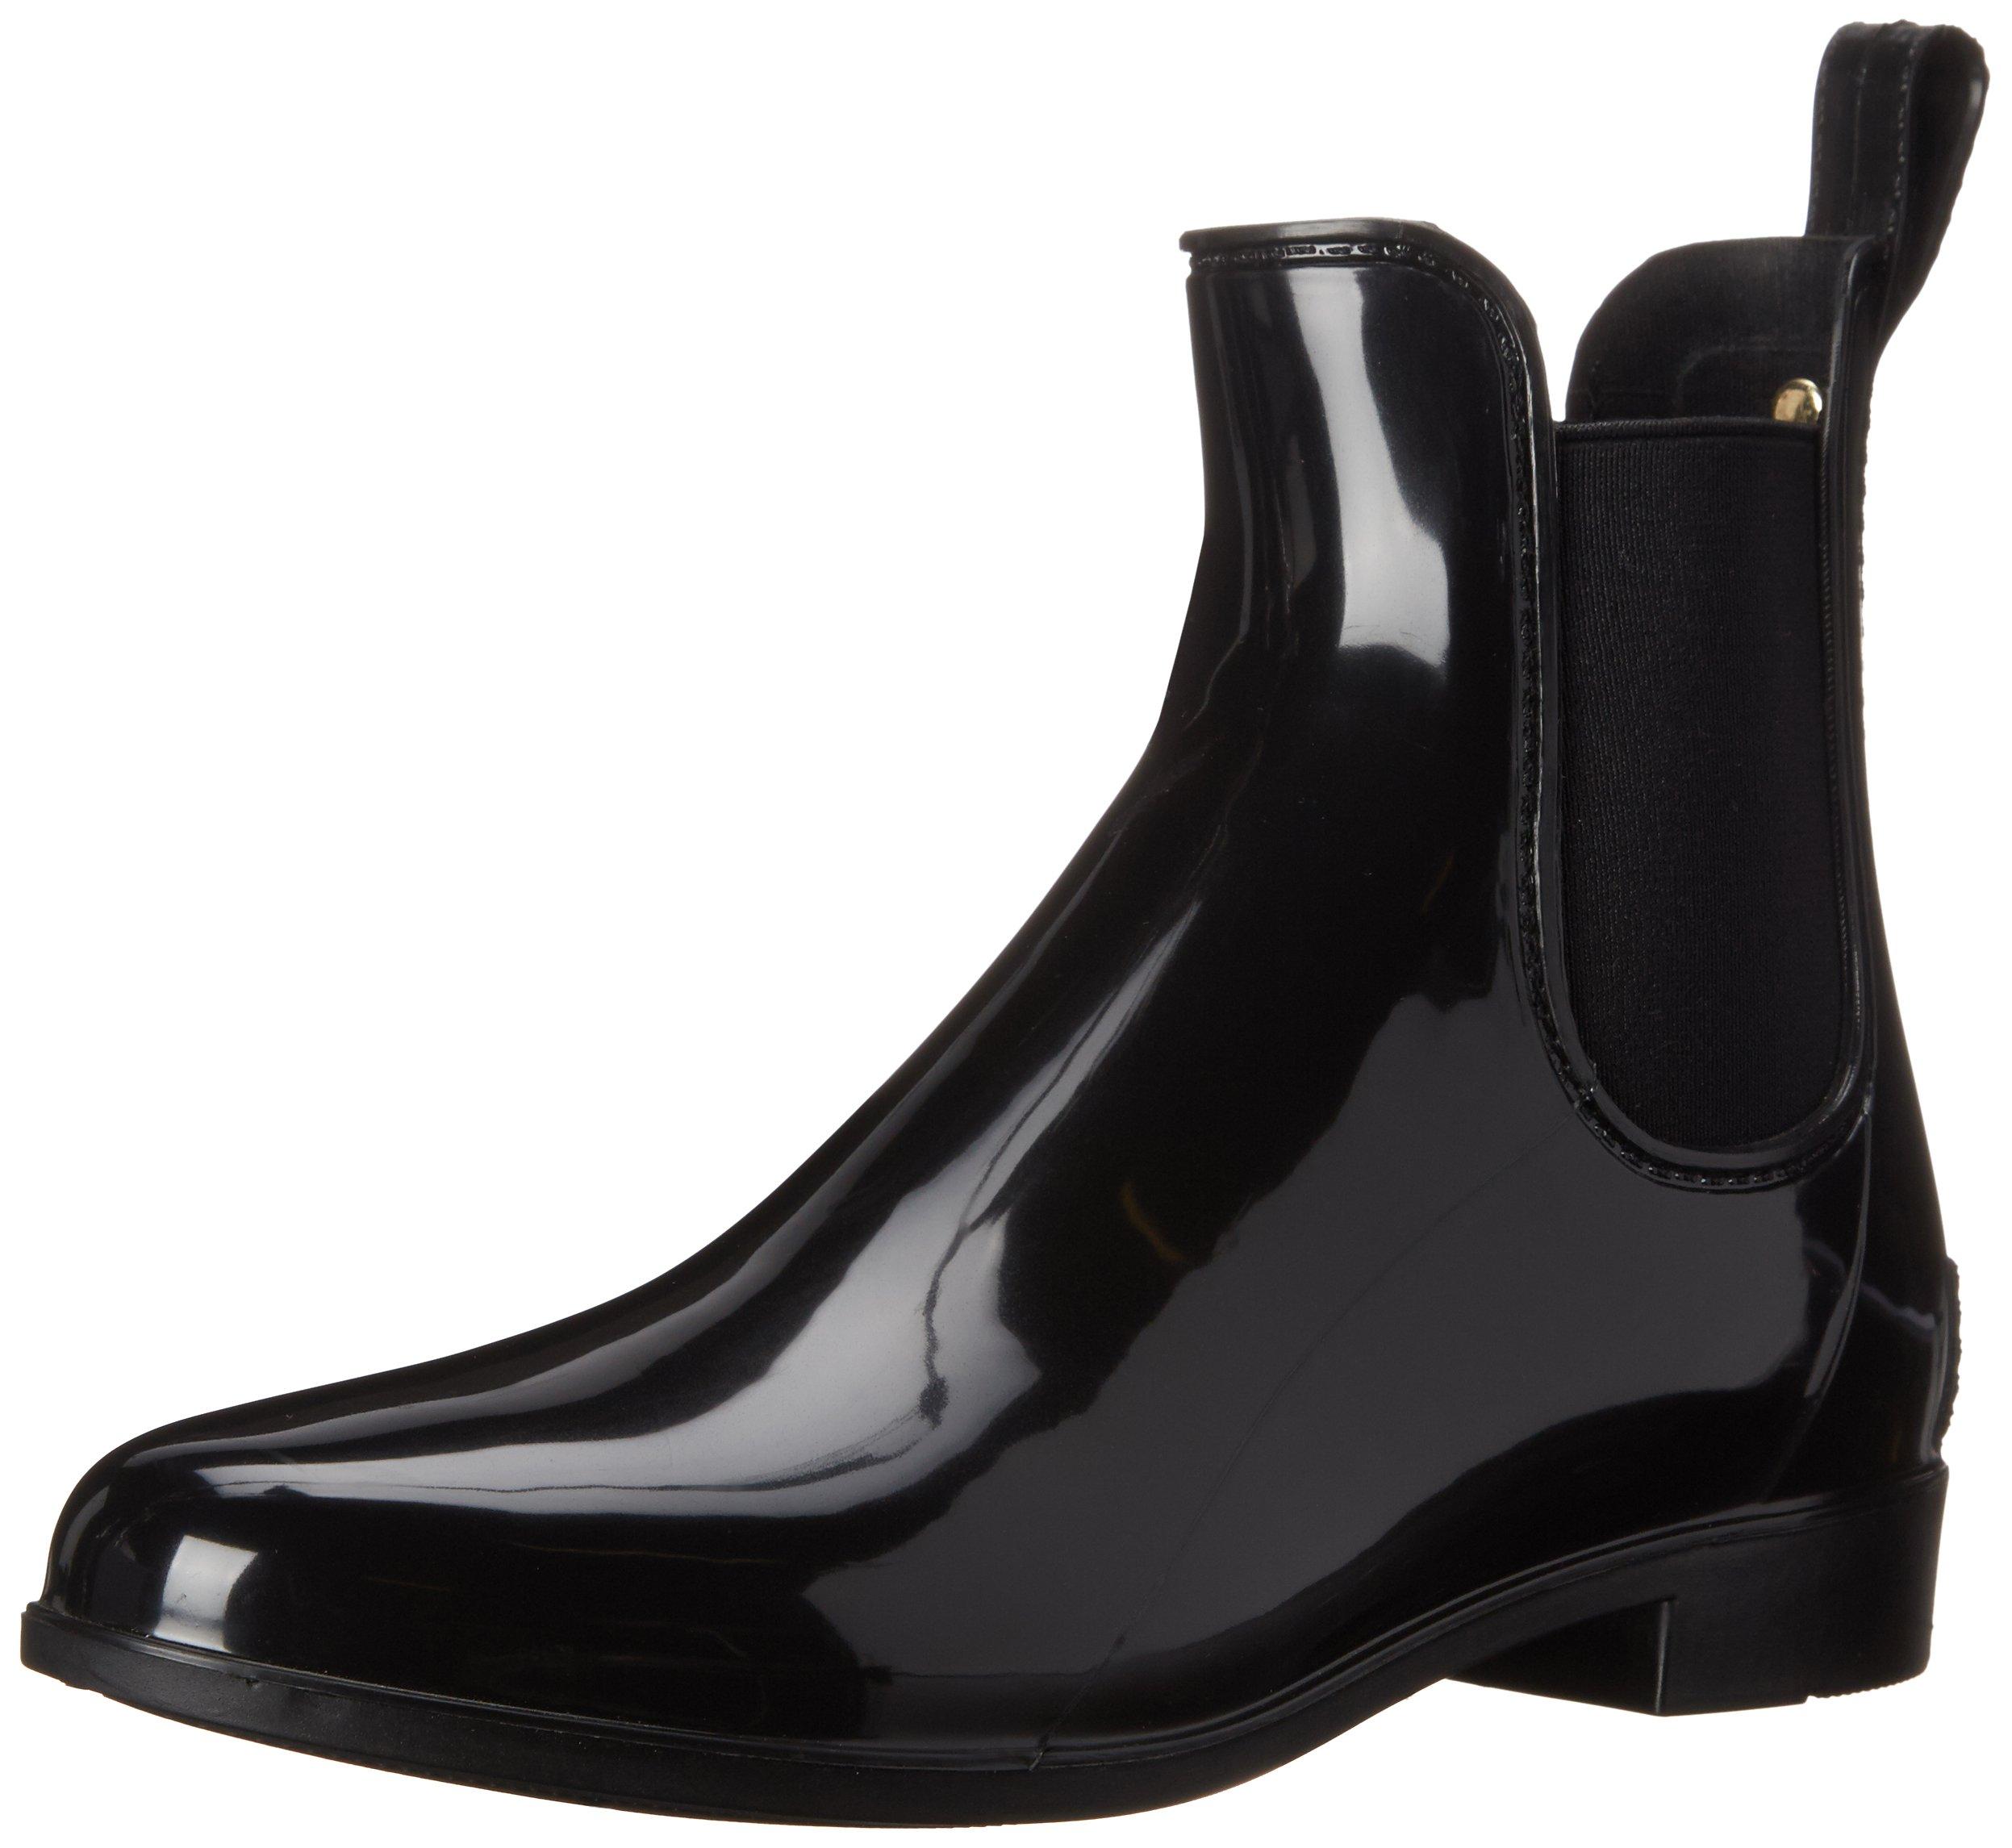 Sam Edelman Women's Tinsley Rain Boot, Black Polished, 9 M US